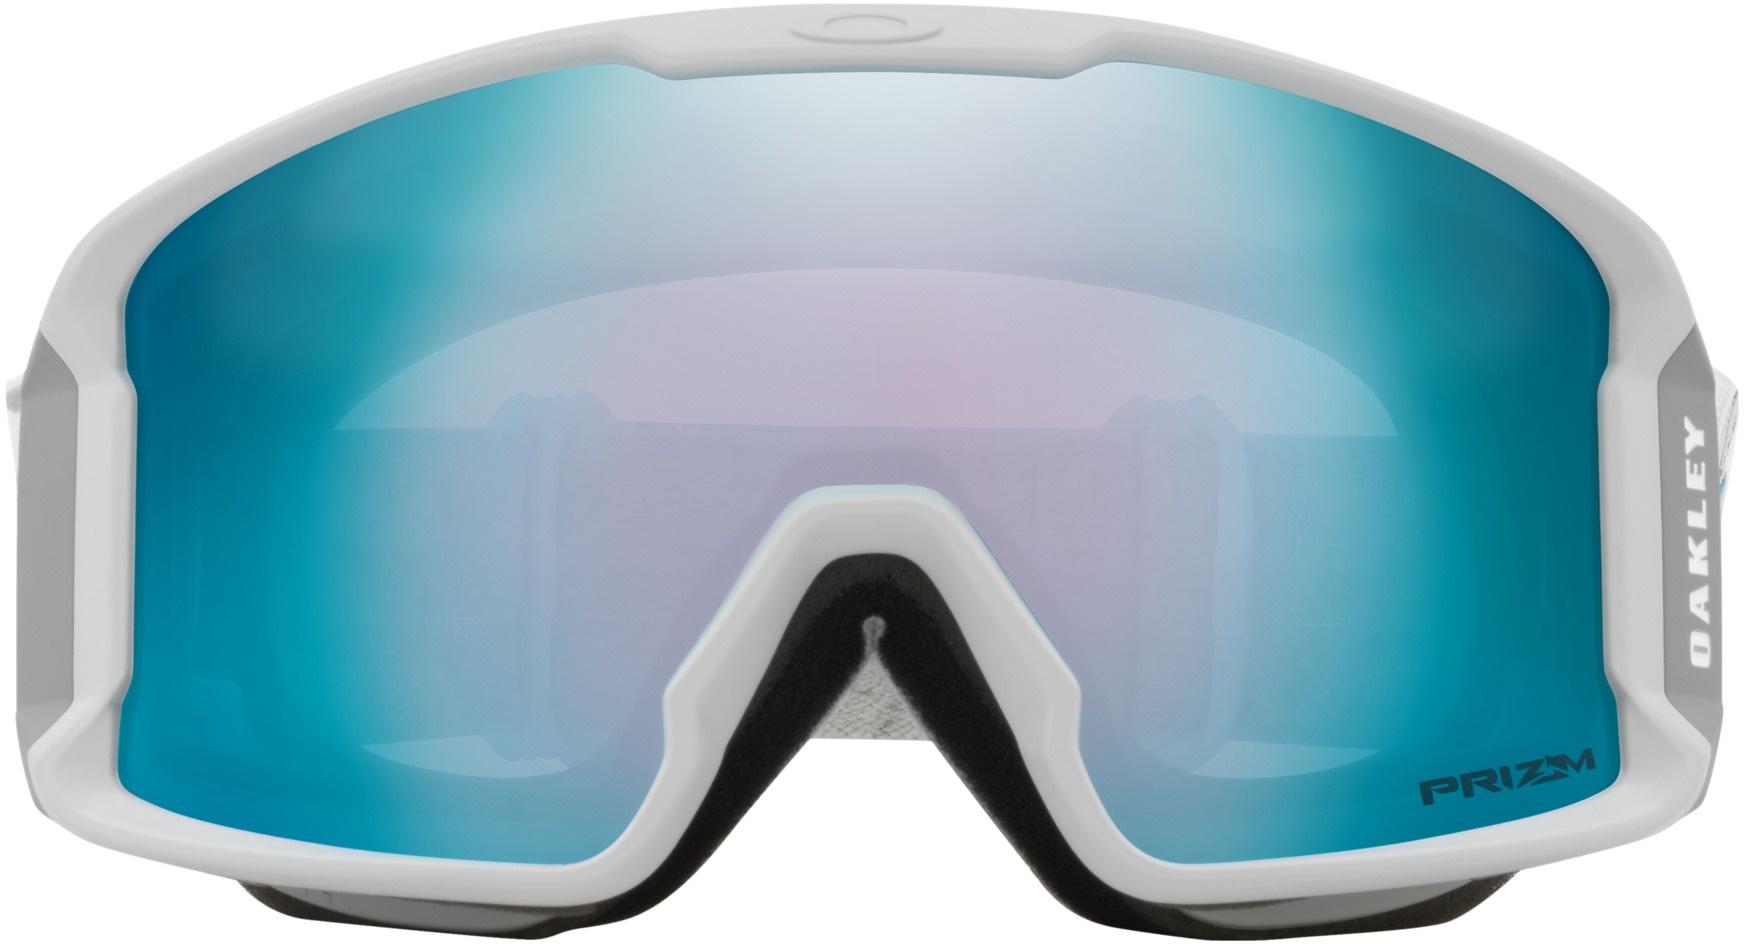 14229d7aaa LINE MINER XM Goggle 2019 camo vine snow prizm sapphire iridium